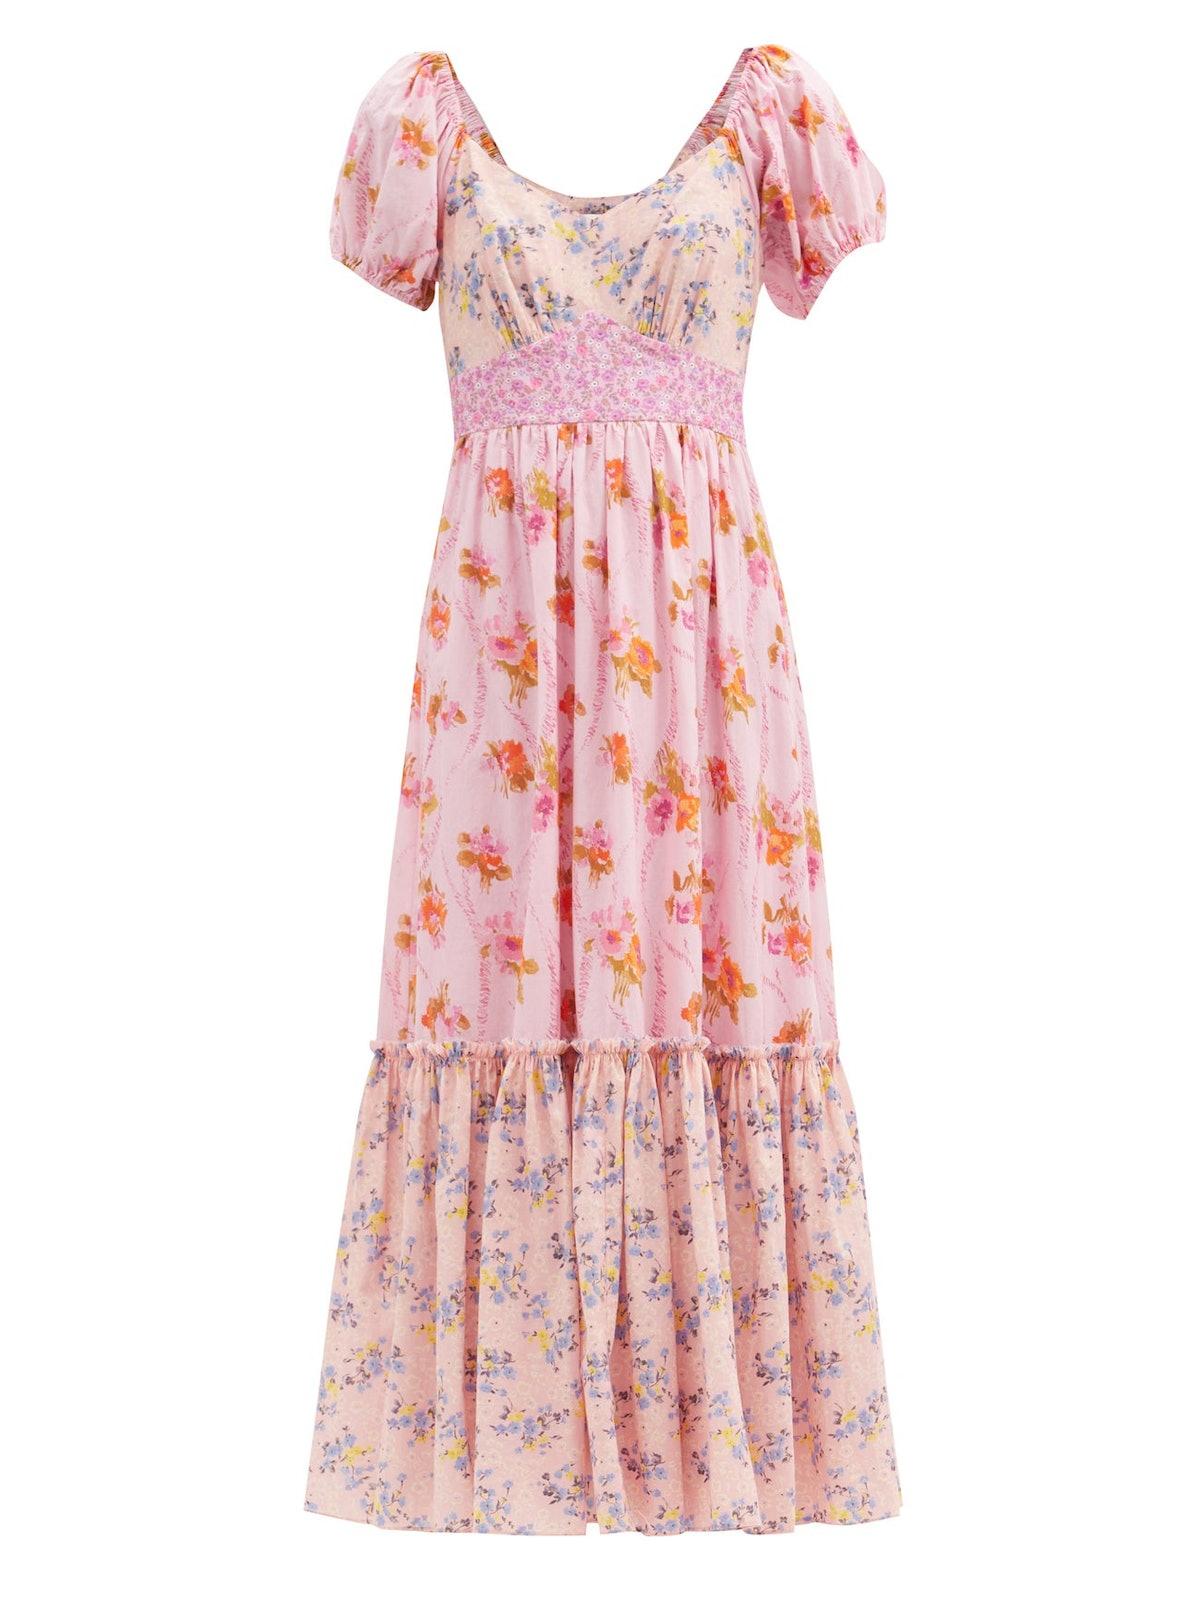 Angie Patchwork Floral-Print Cotton Midi Dress